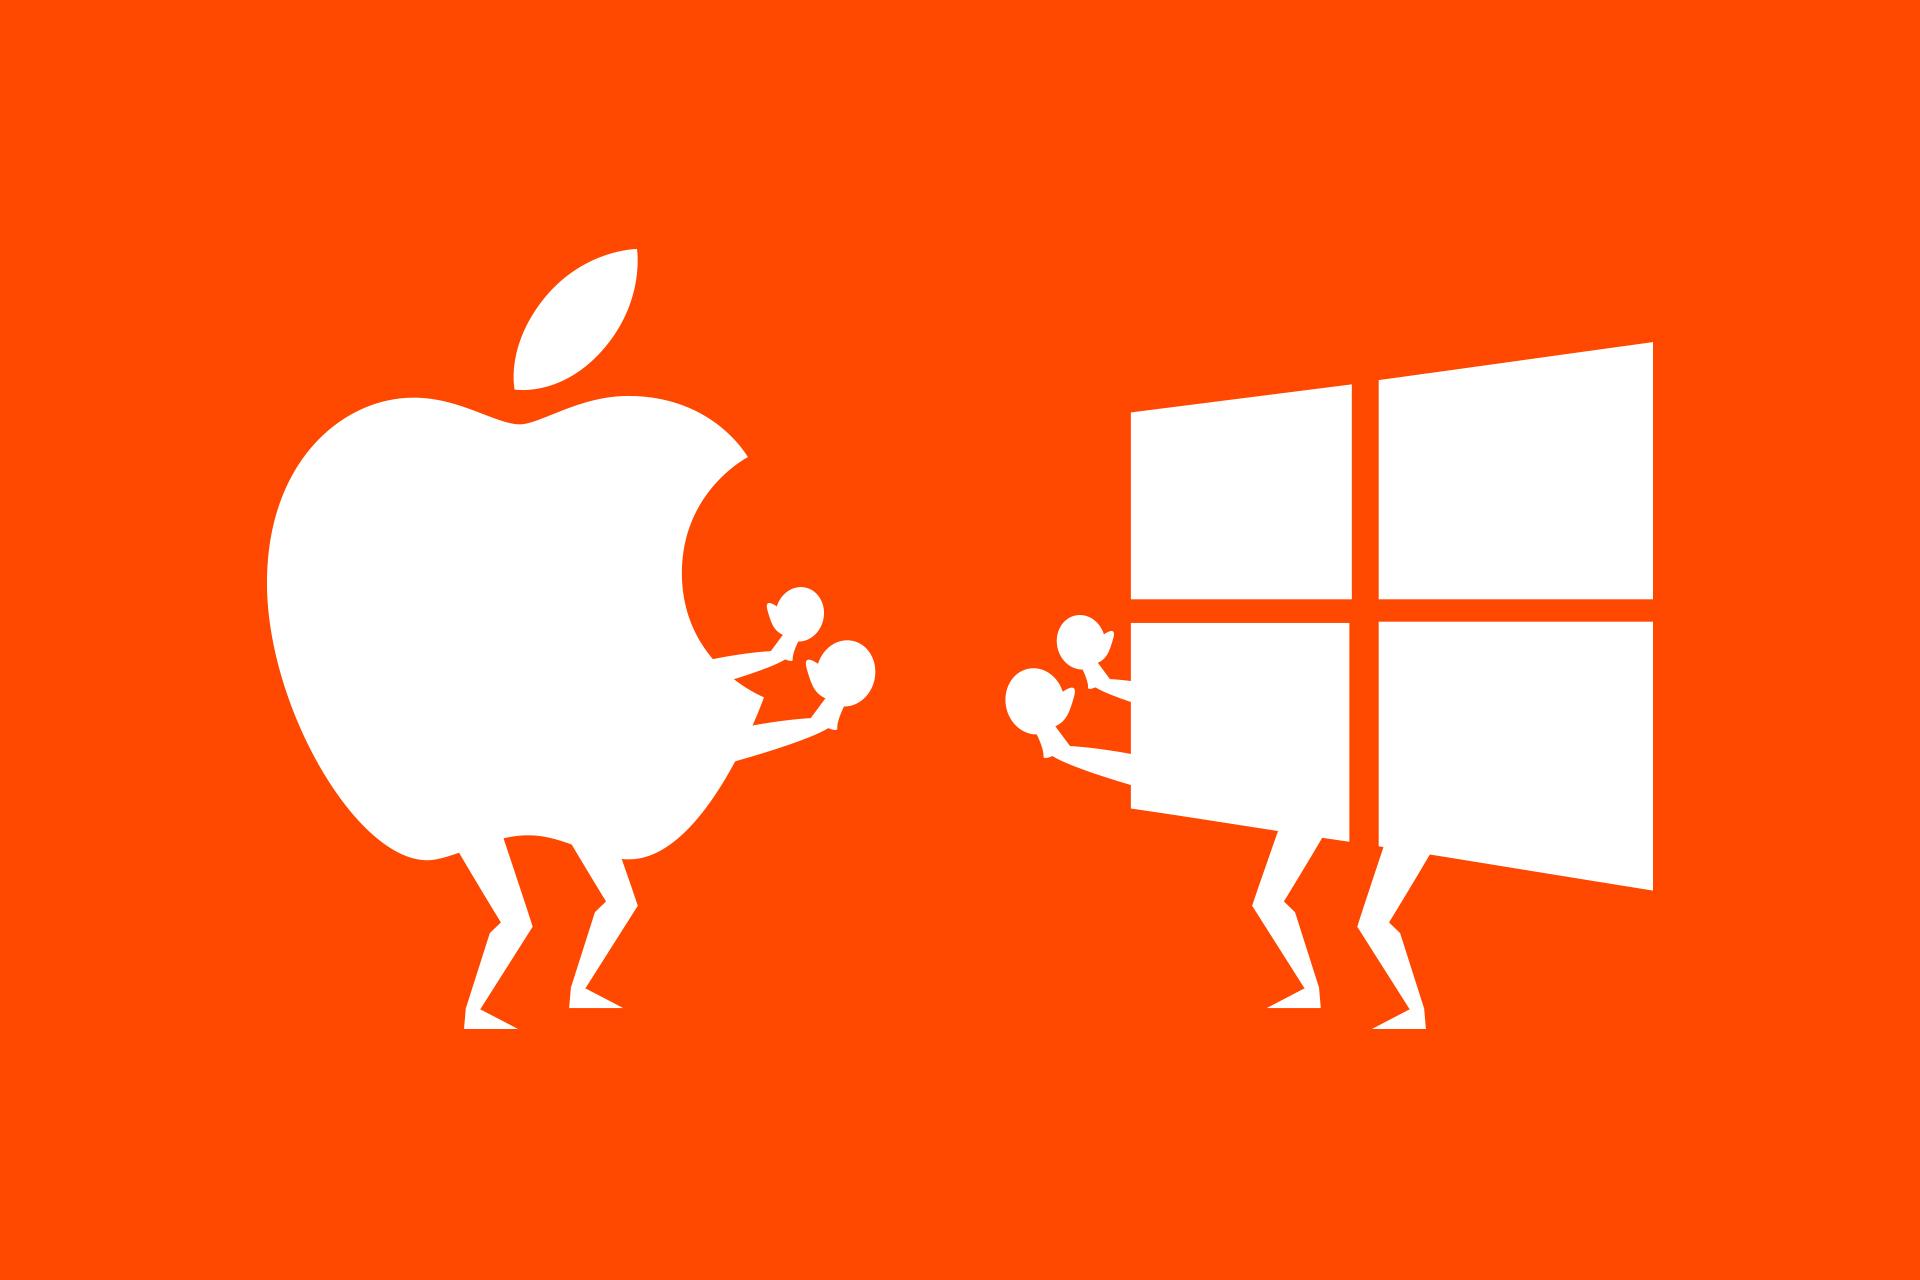 Marketing wars apple vs microsoft